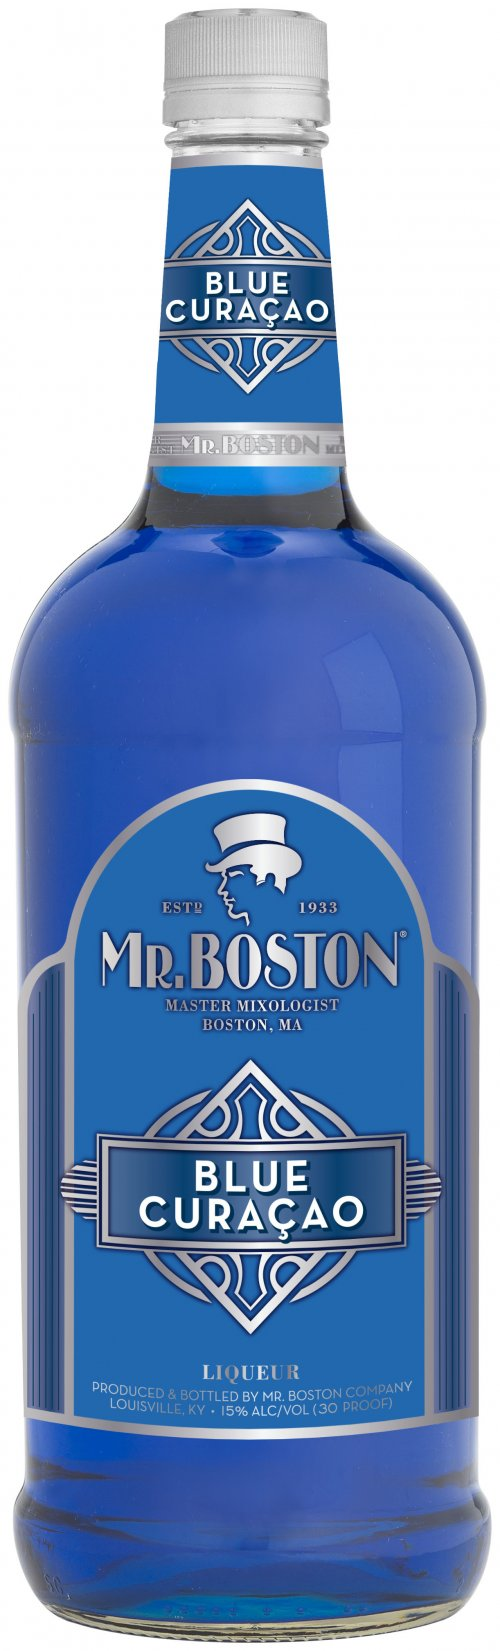 Mr. Boston Blue Curacao